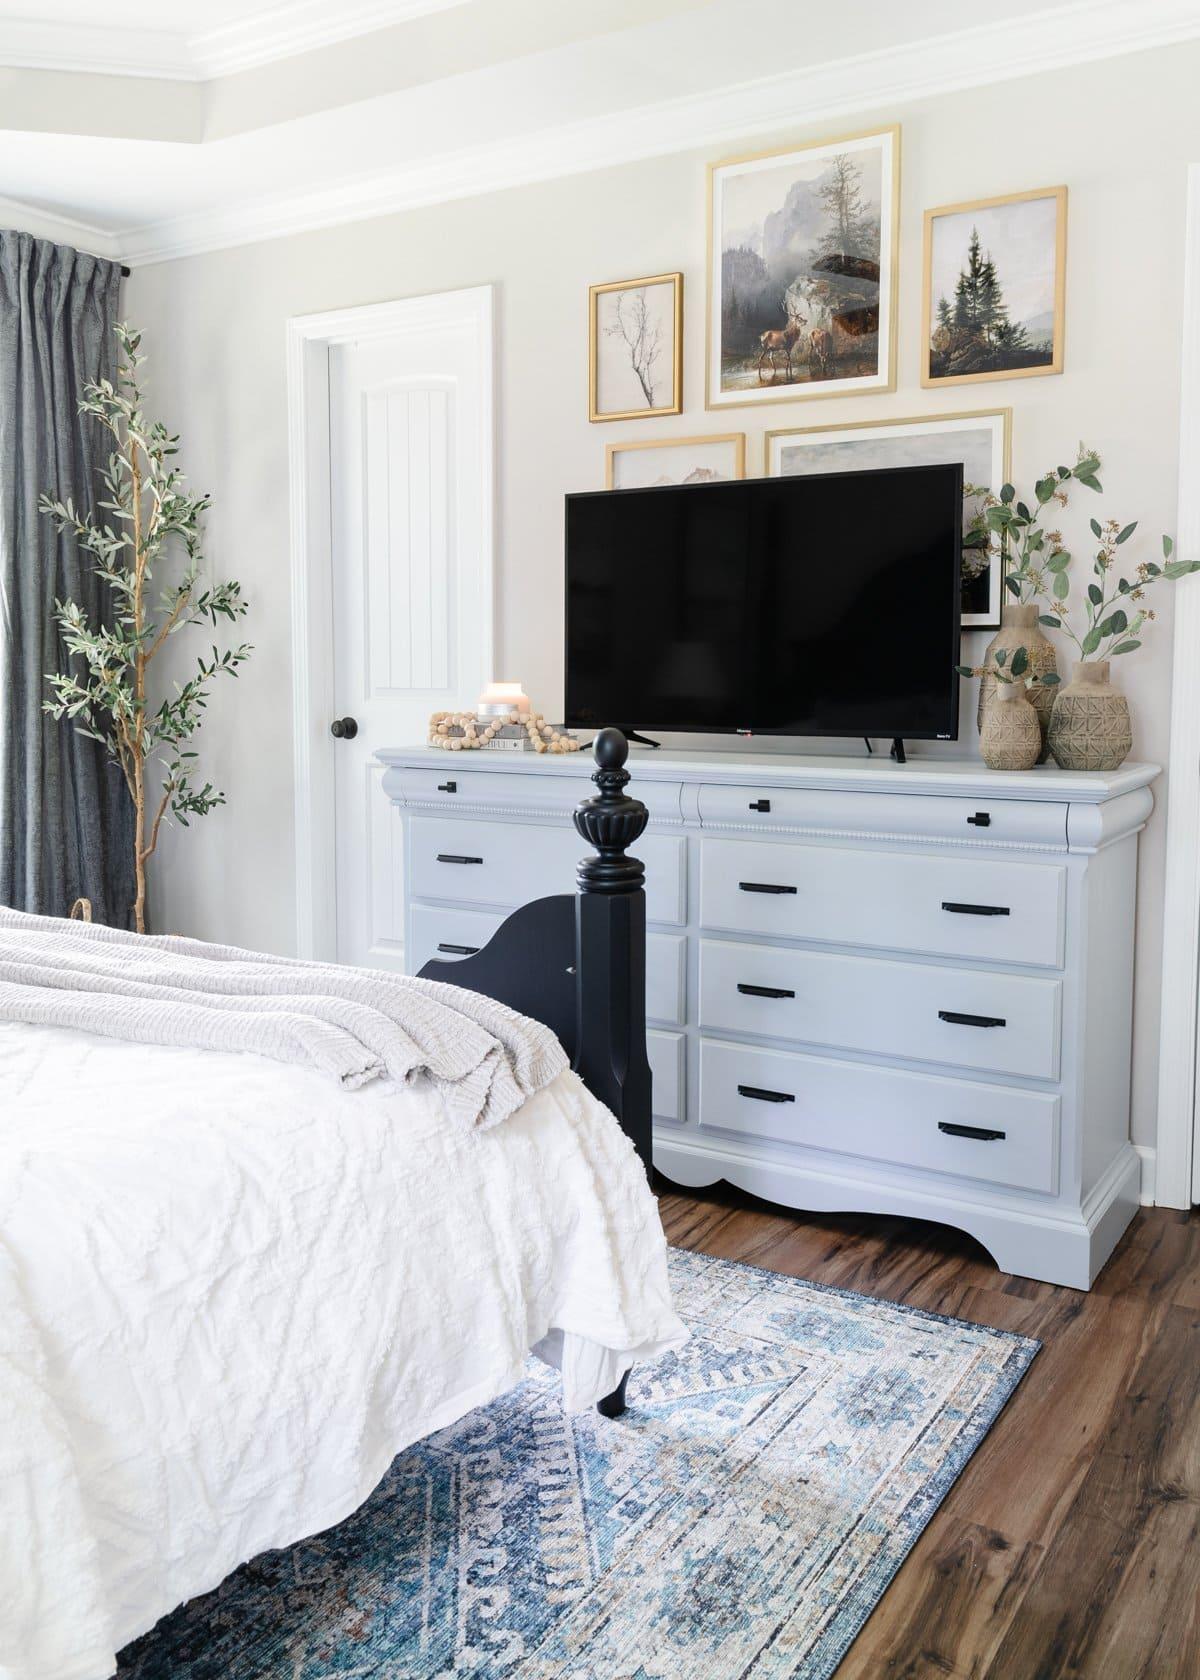 TV on Dresser in Bedroom Ideas